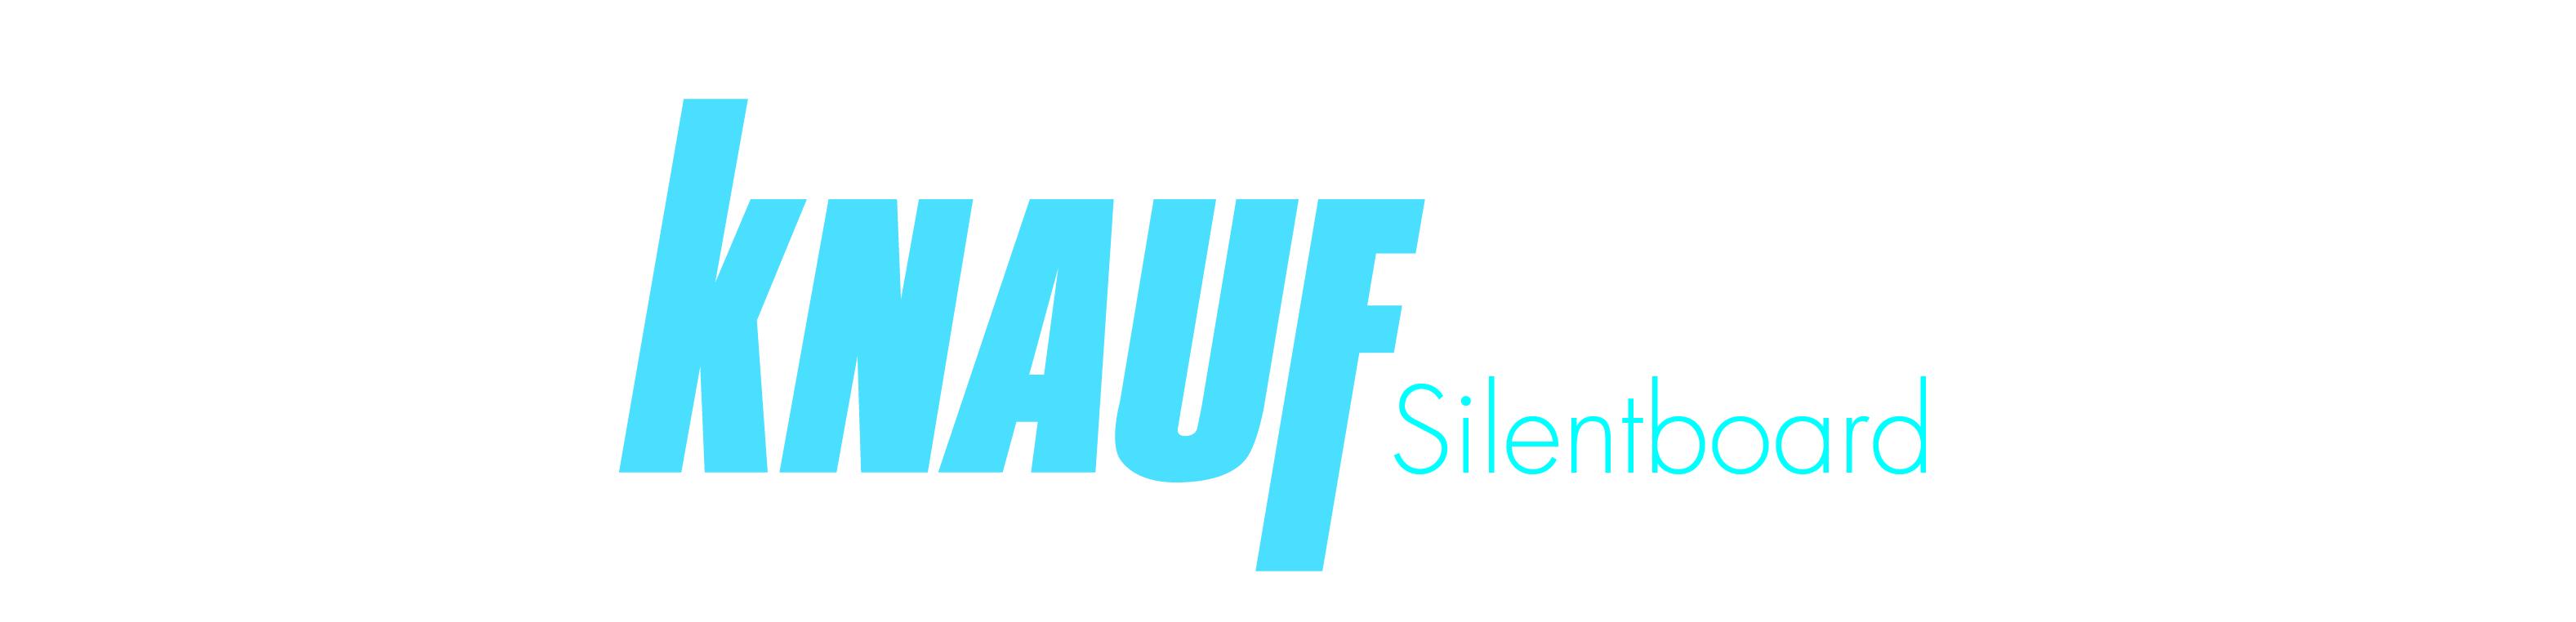 logotipo knauf silentboard